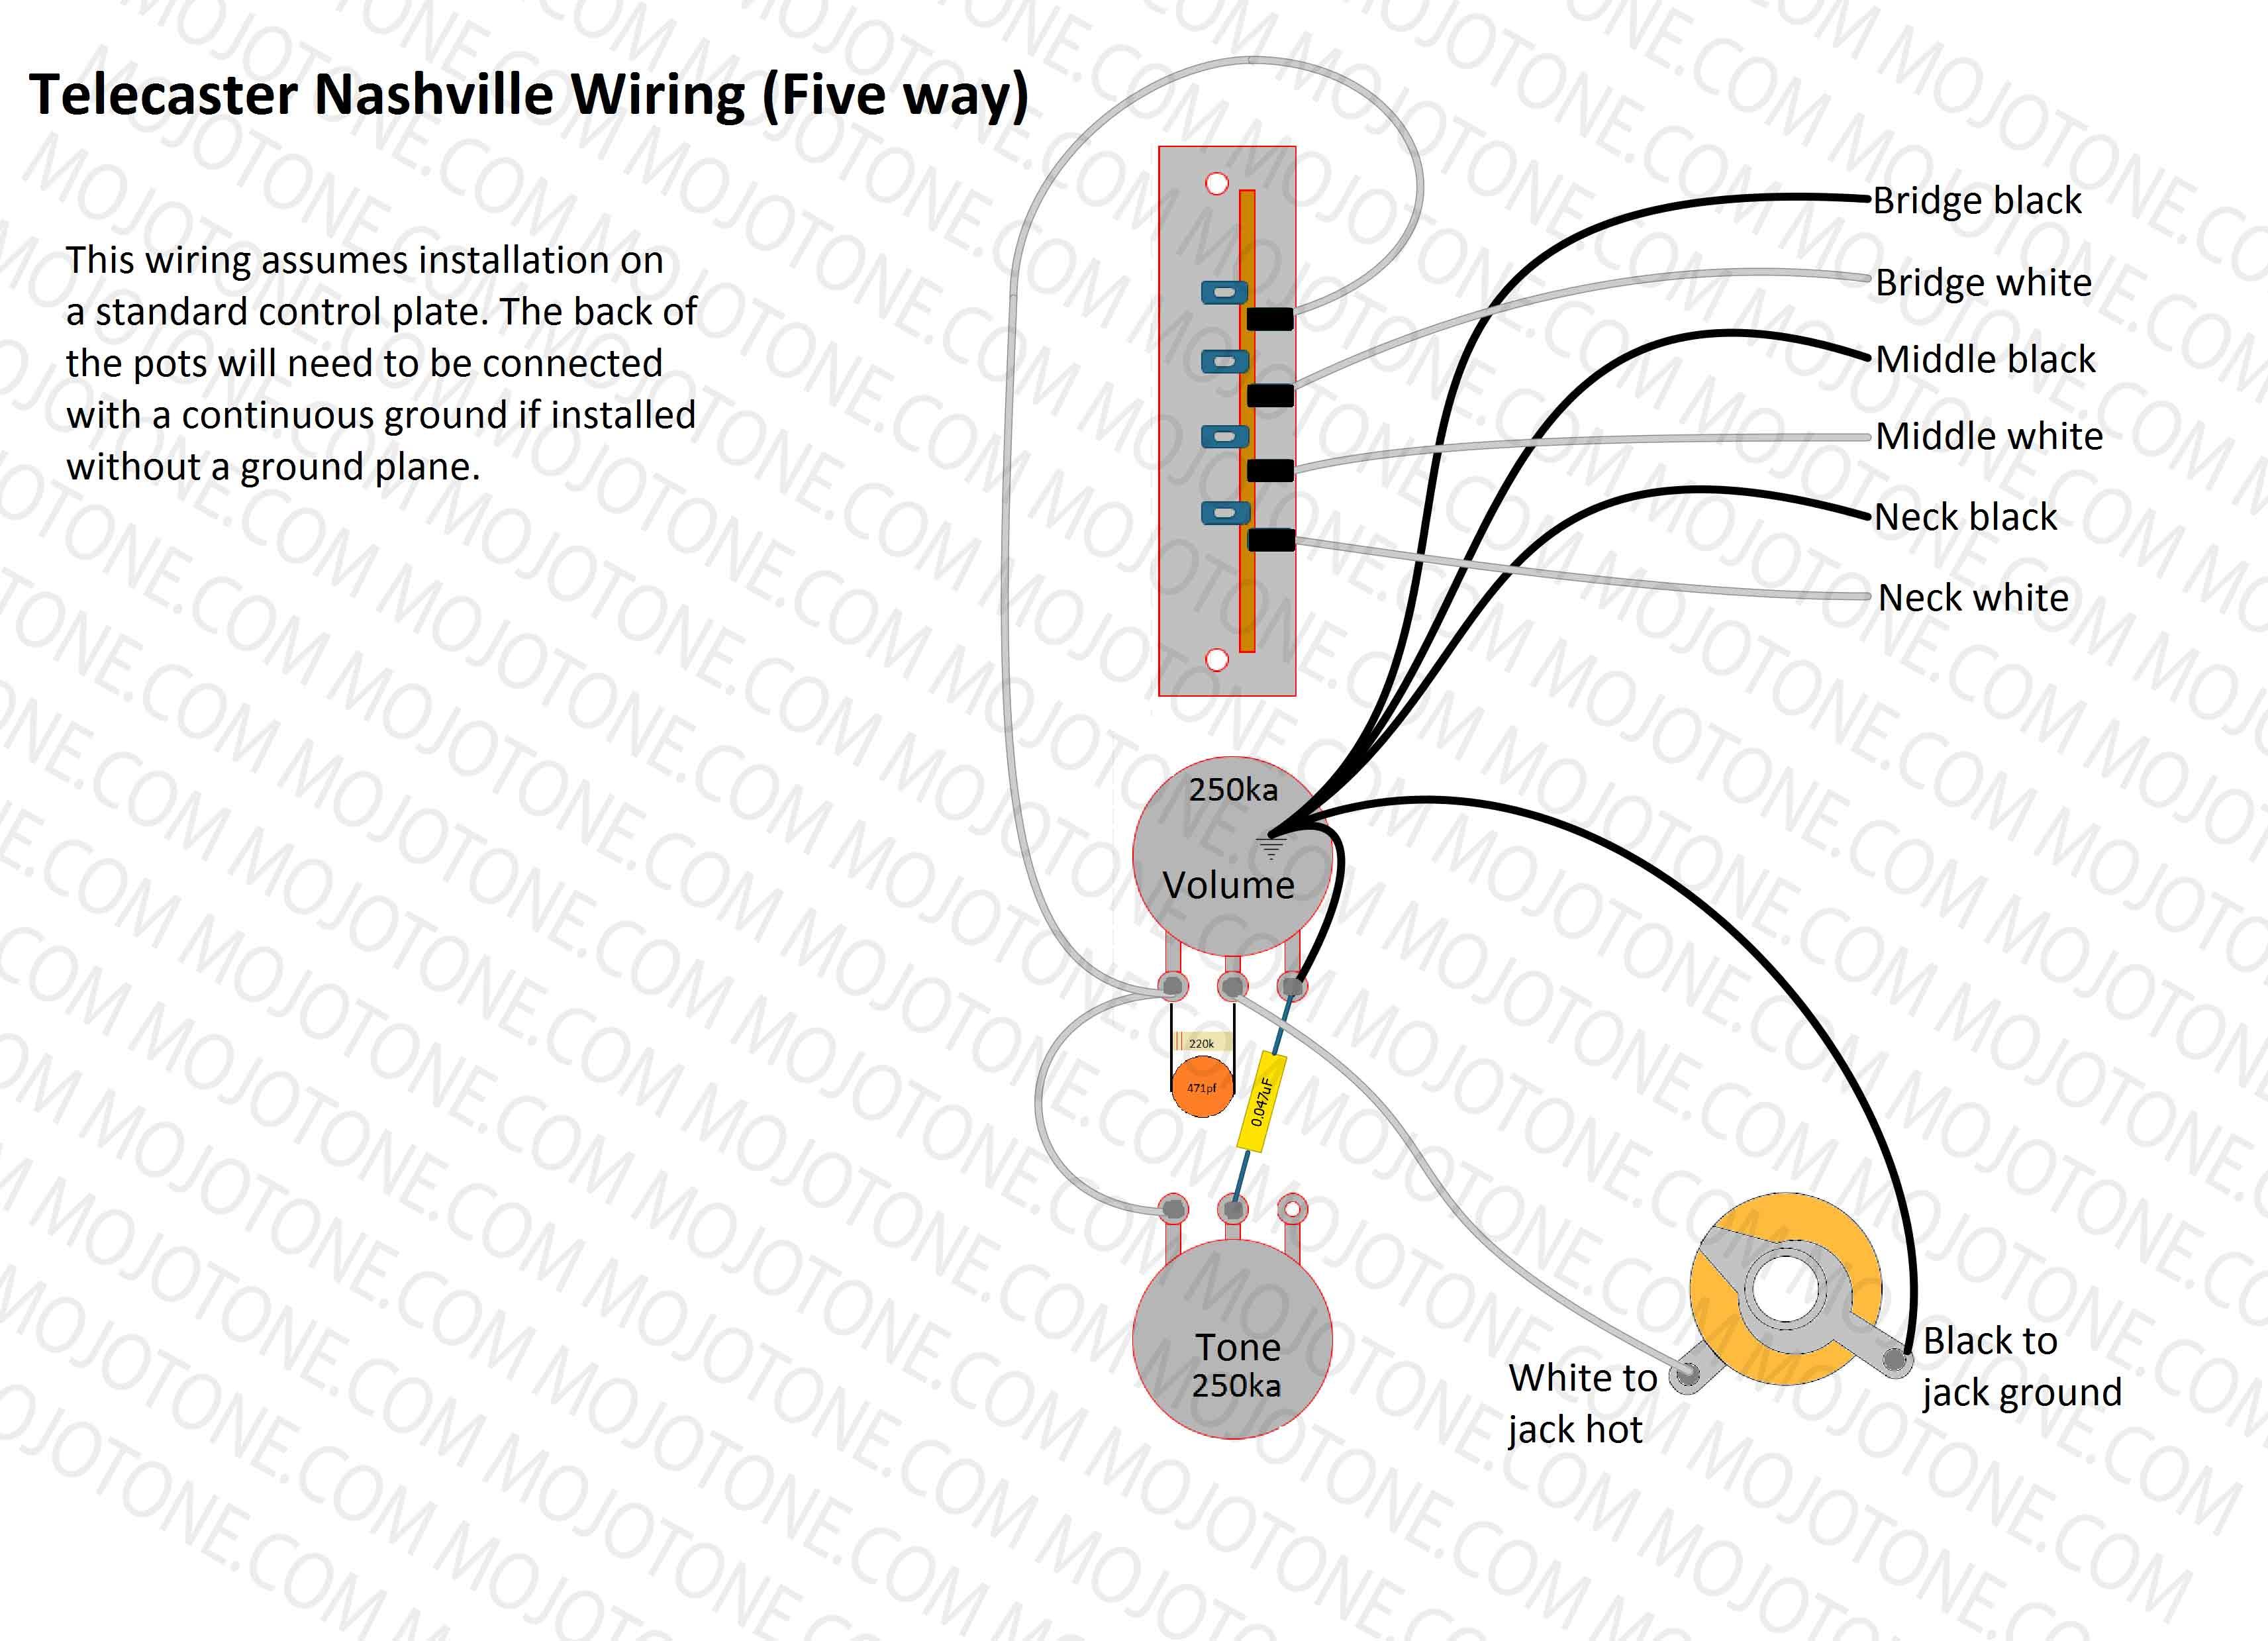 Telecaster Nashville Wiring Diagram - Jazzmaster Wiring Diagram